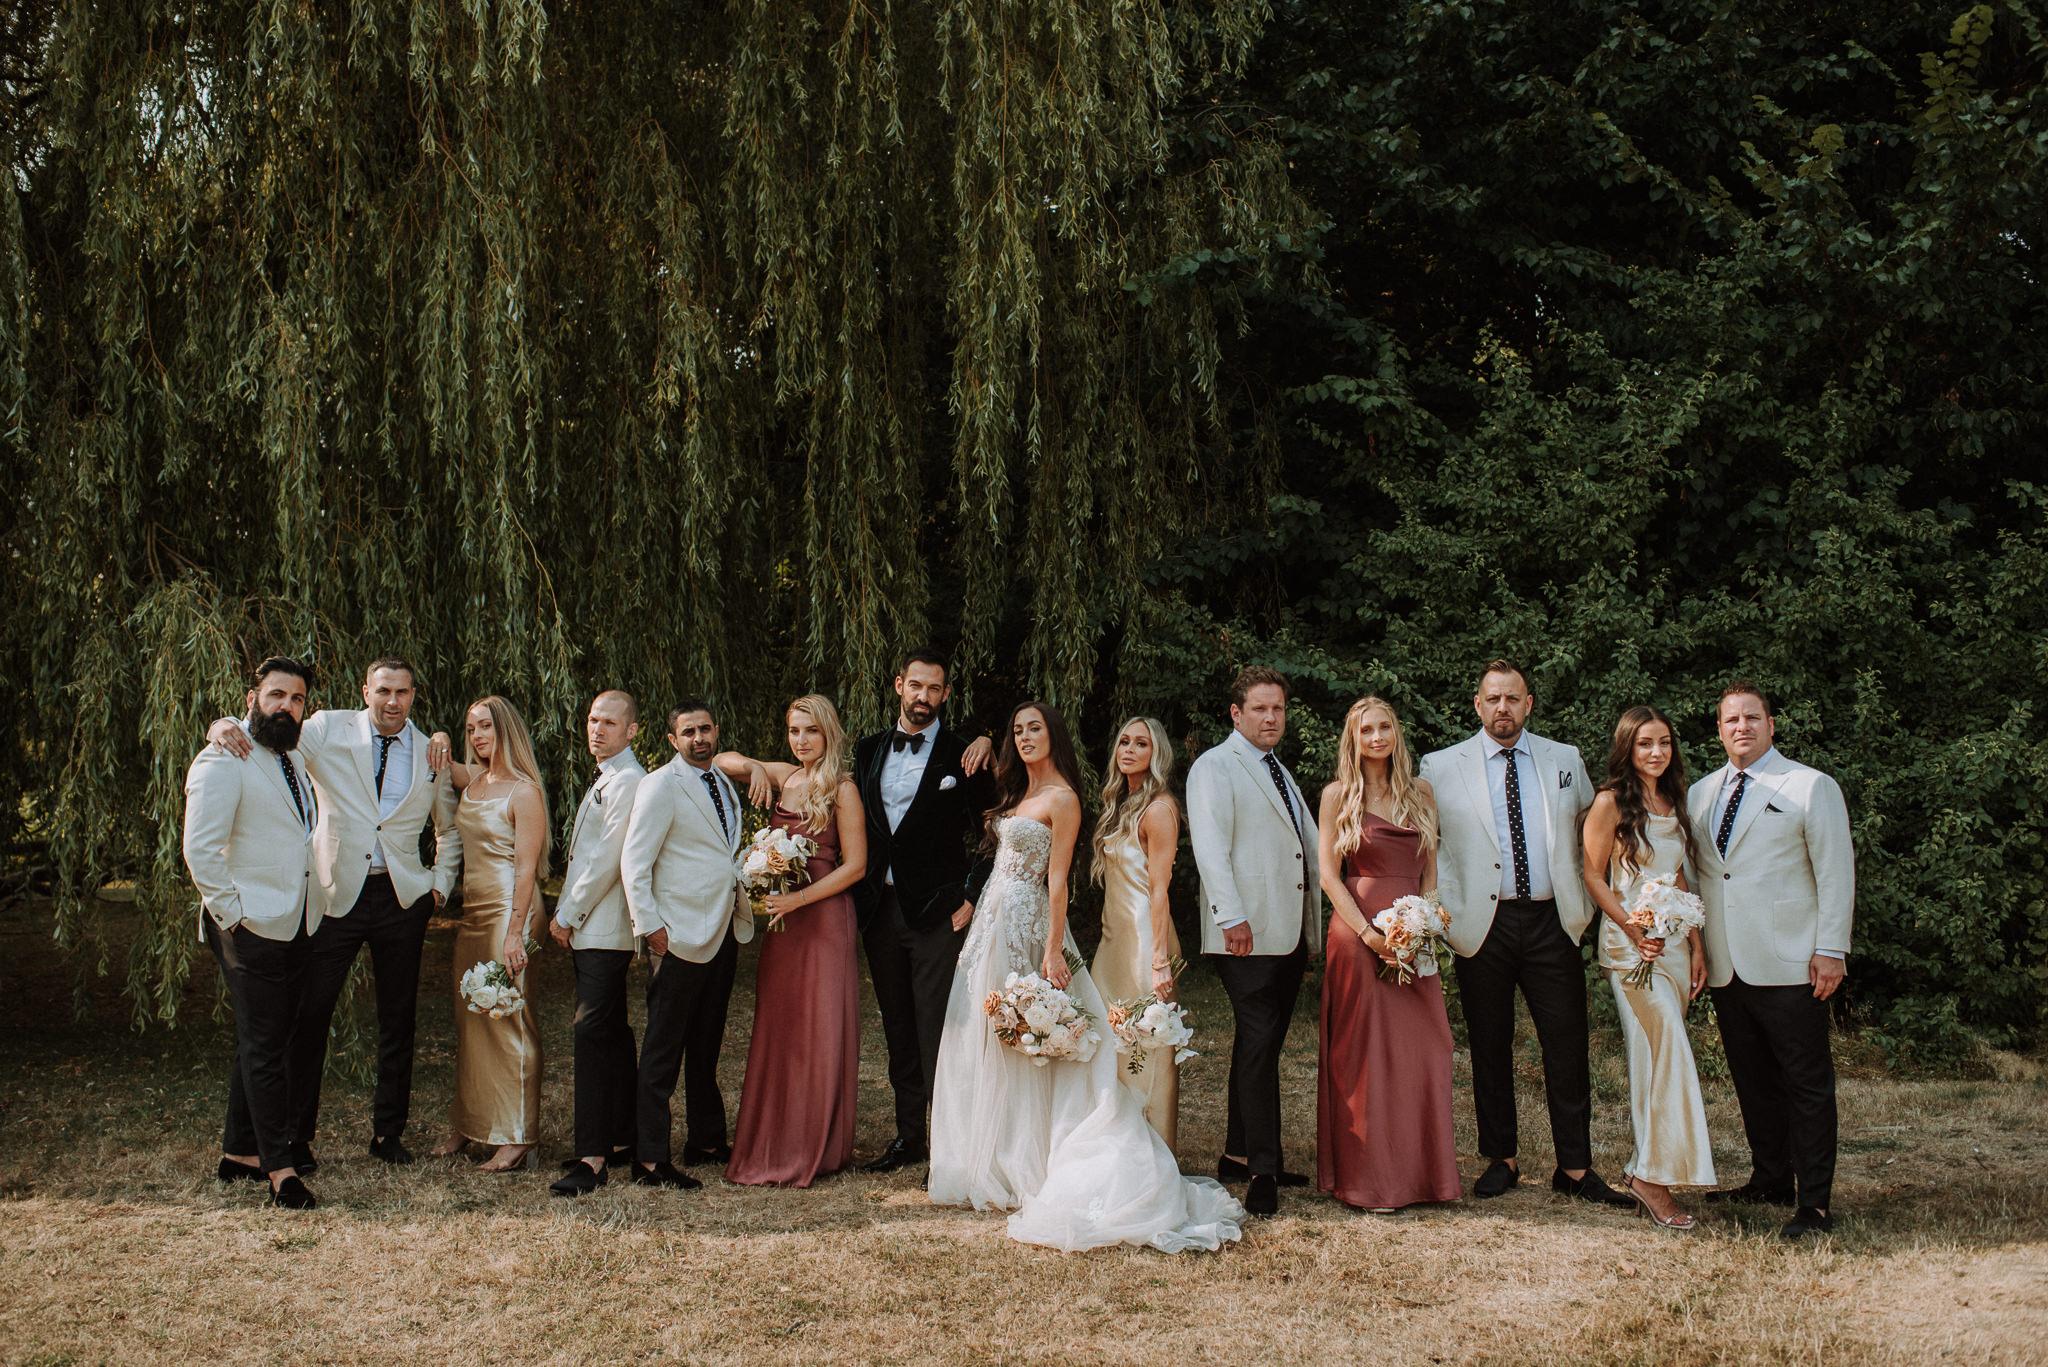 Best Wedding Photos in Vancouver 5